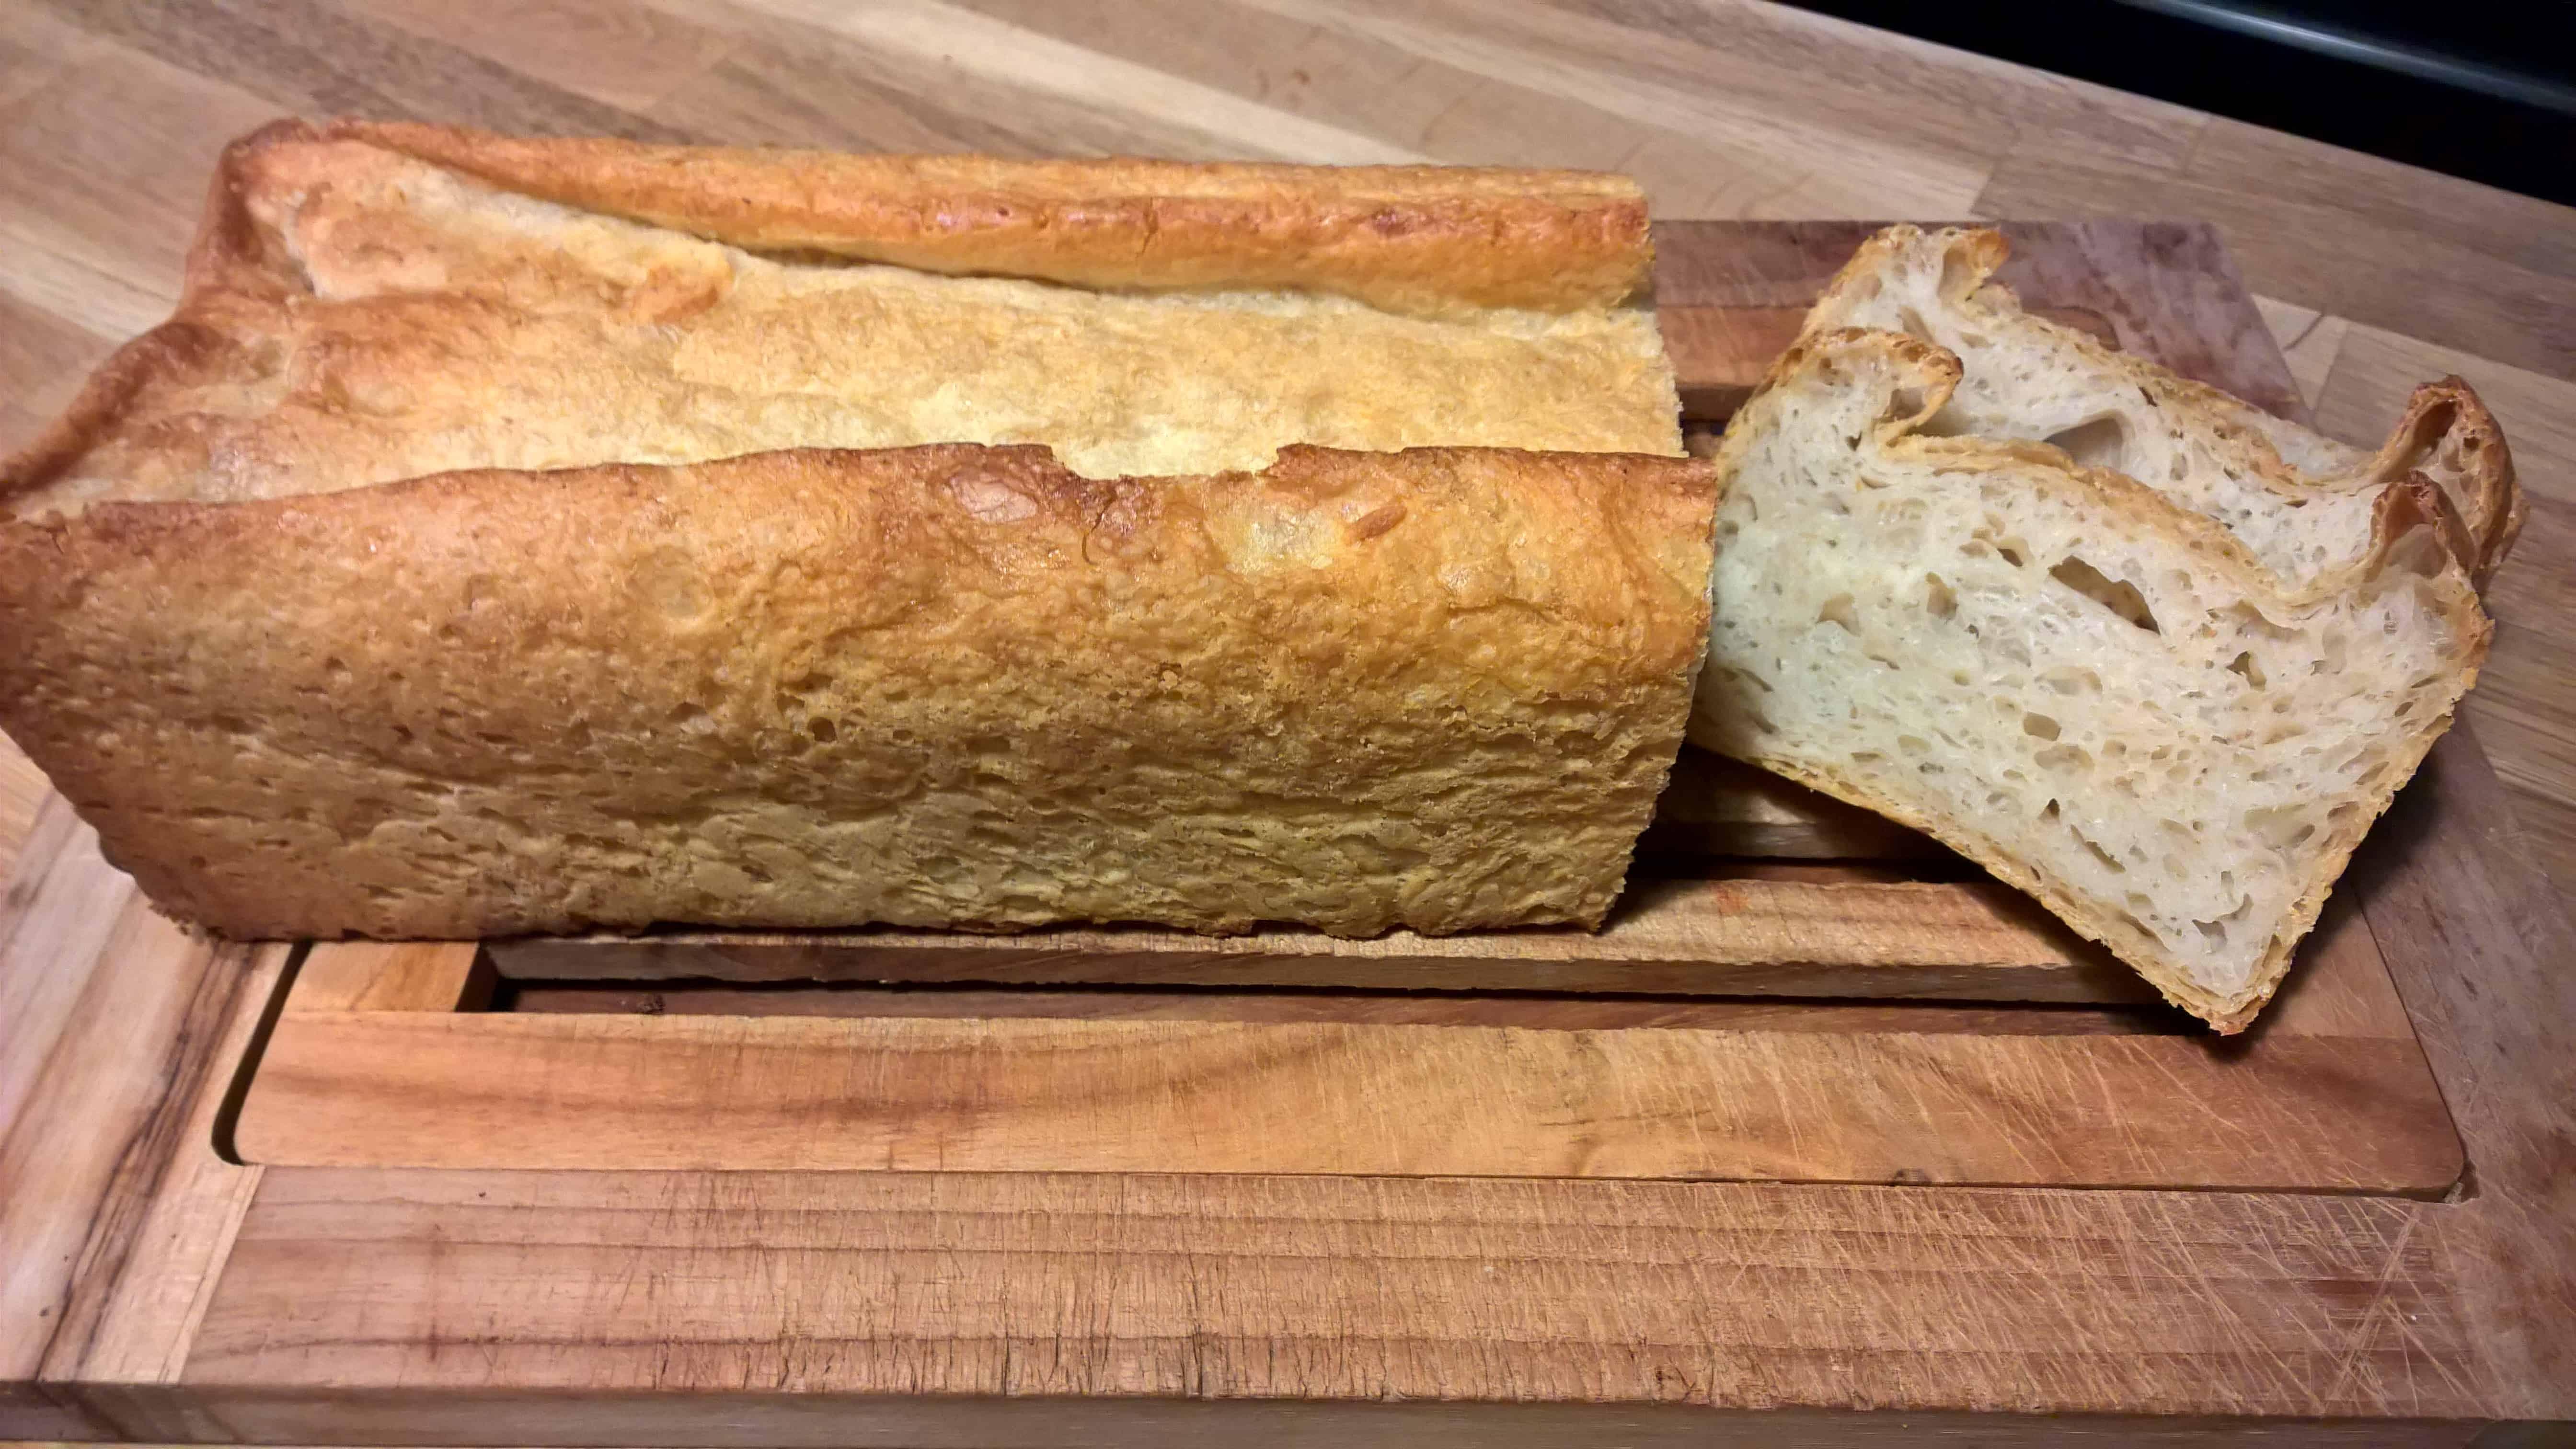 Sandwich – Pullman loaf